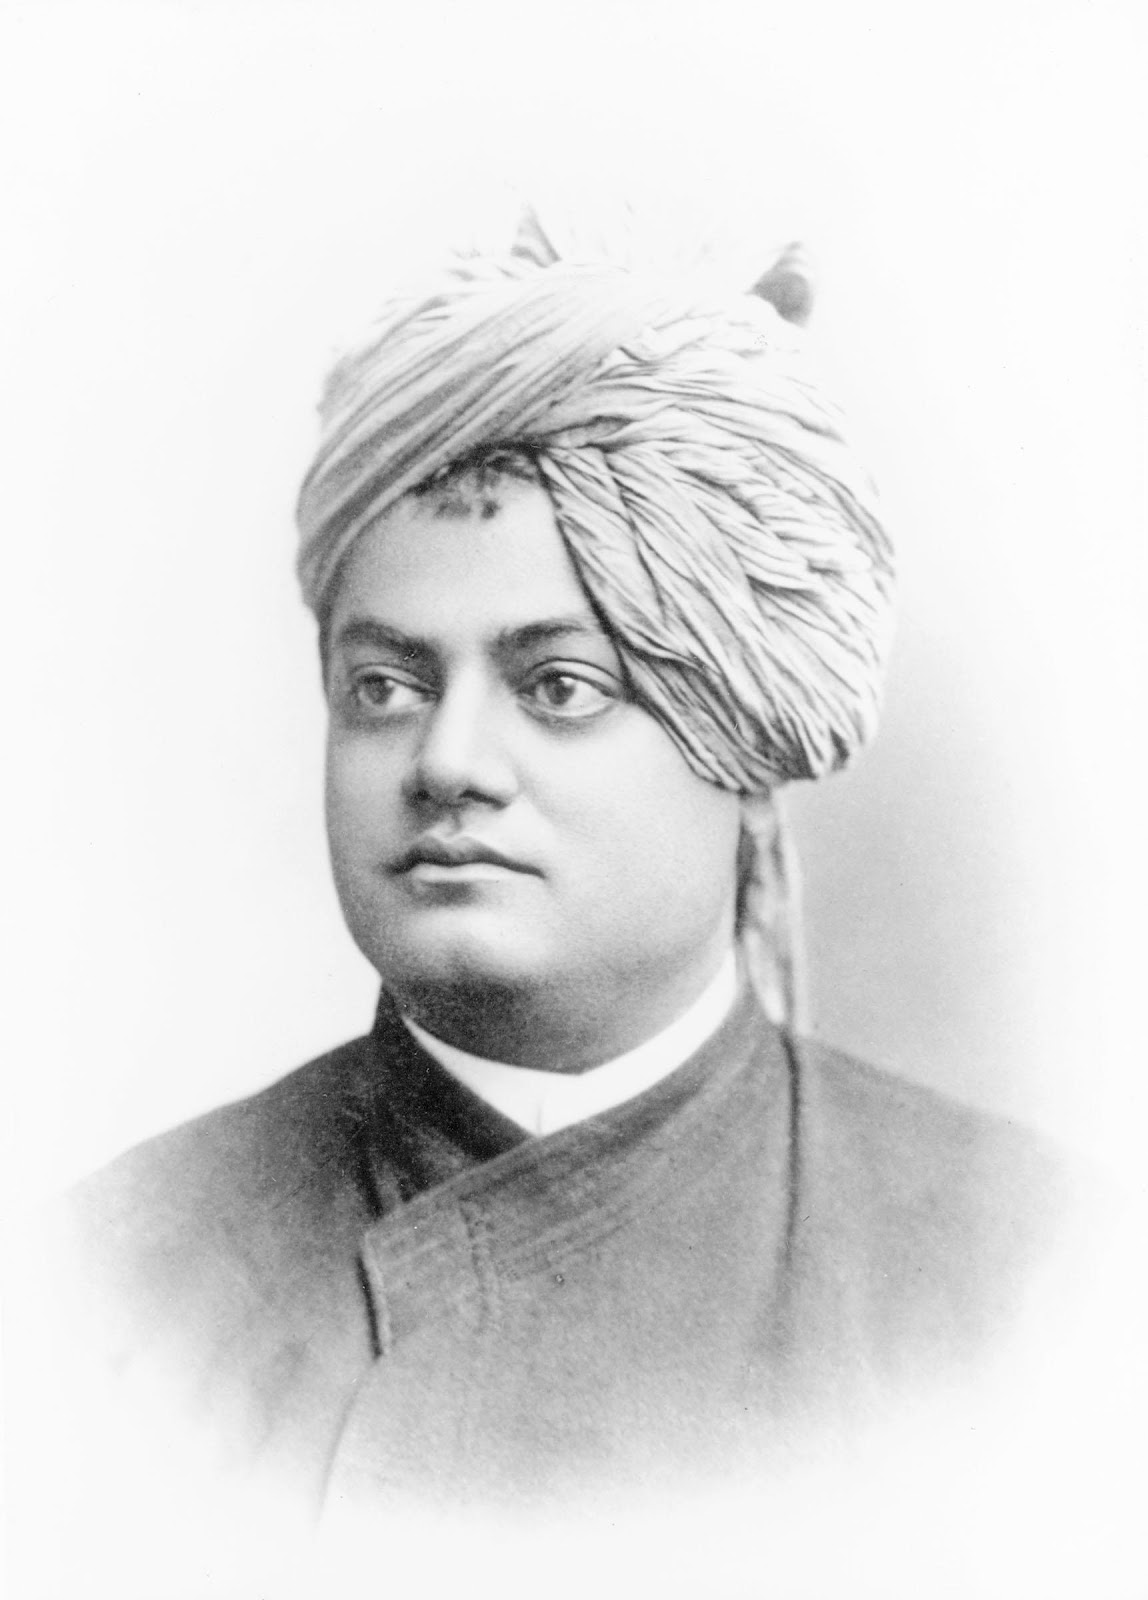 swami vivekananda on science and education nirvana swami vivekananda on science and education